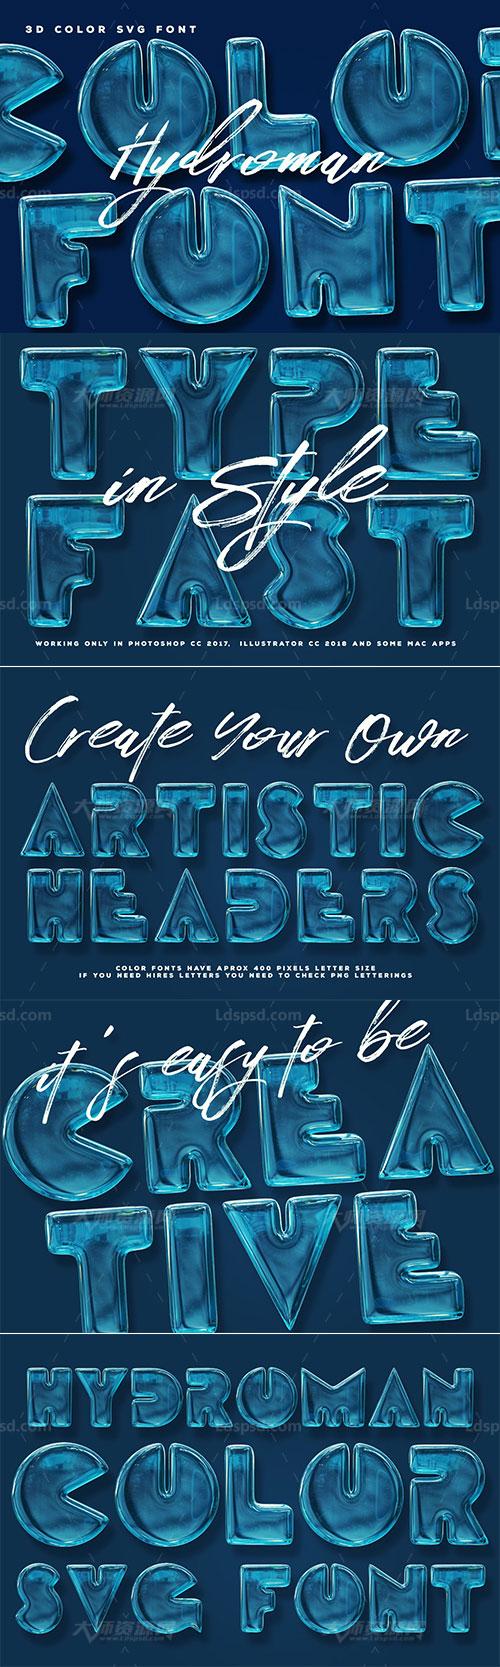 逼真的冰封SVG英文字体:Hydroman Color Font